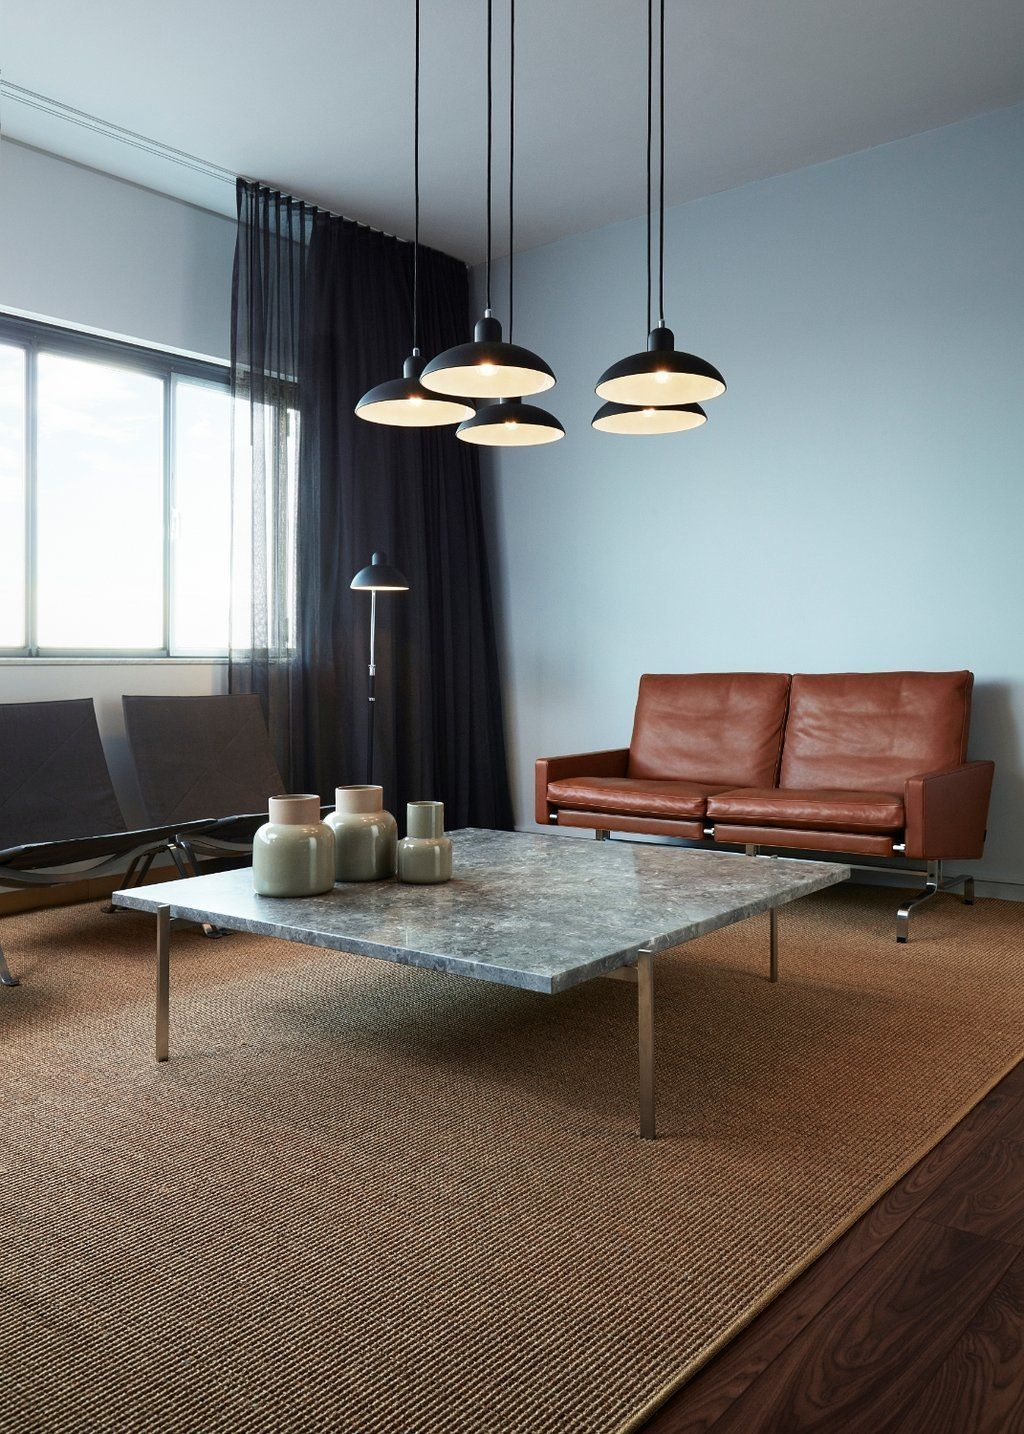 Royal Living Room Design: Radisson Collection Royal Hotel, Copenhagen